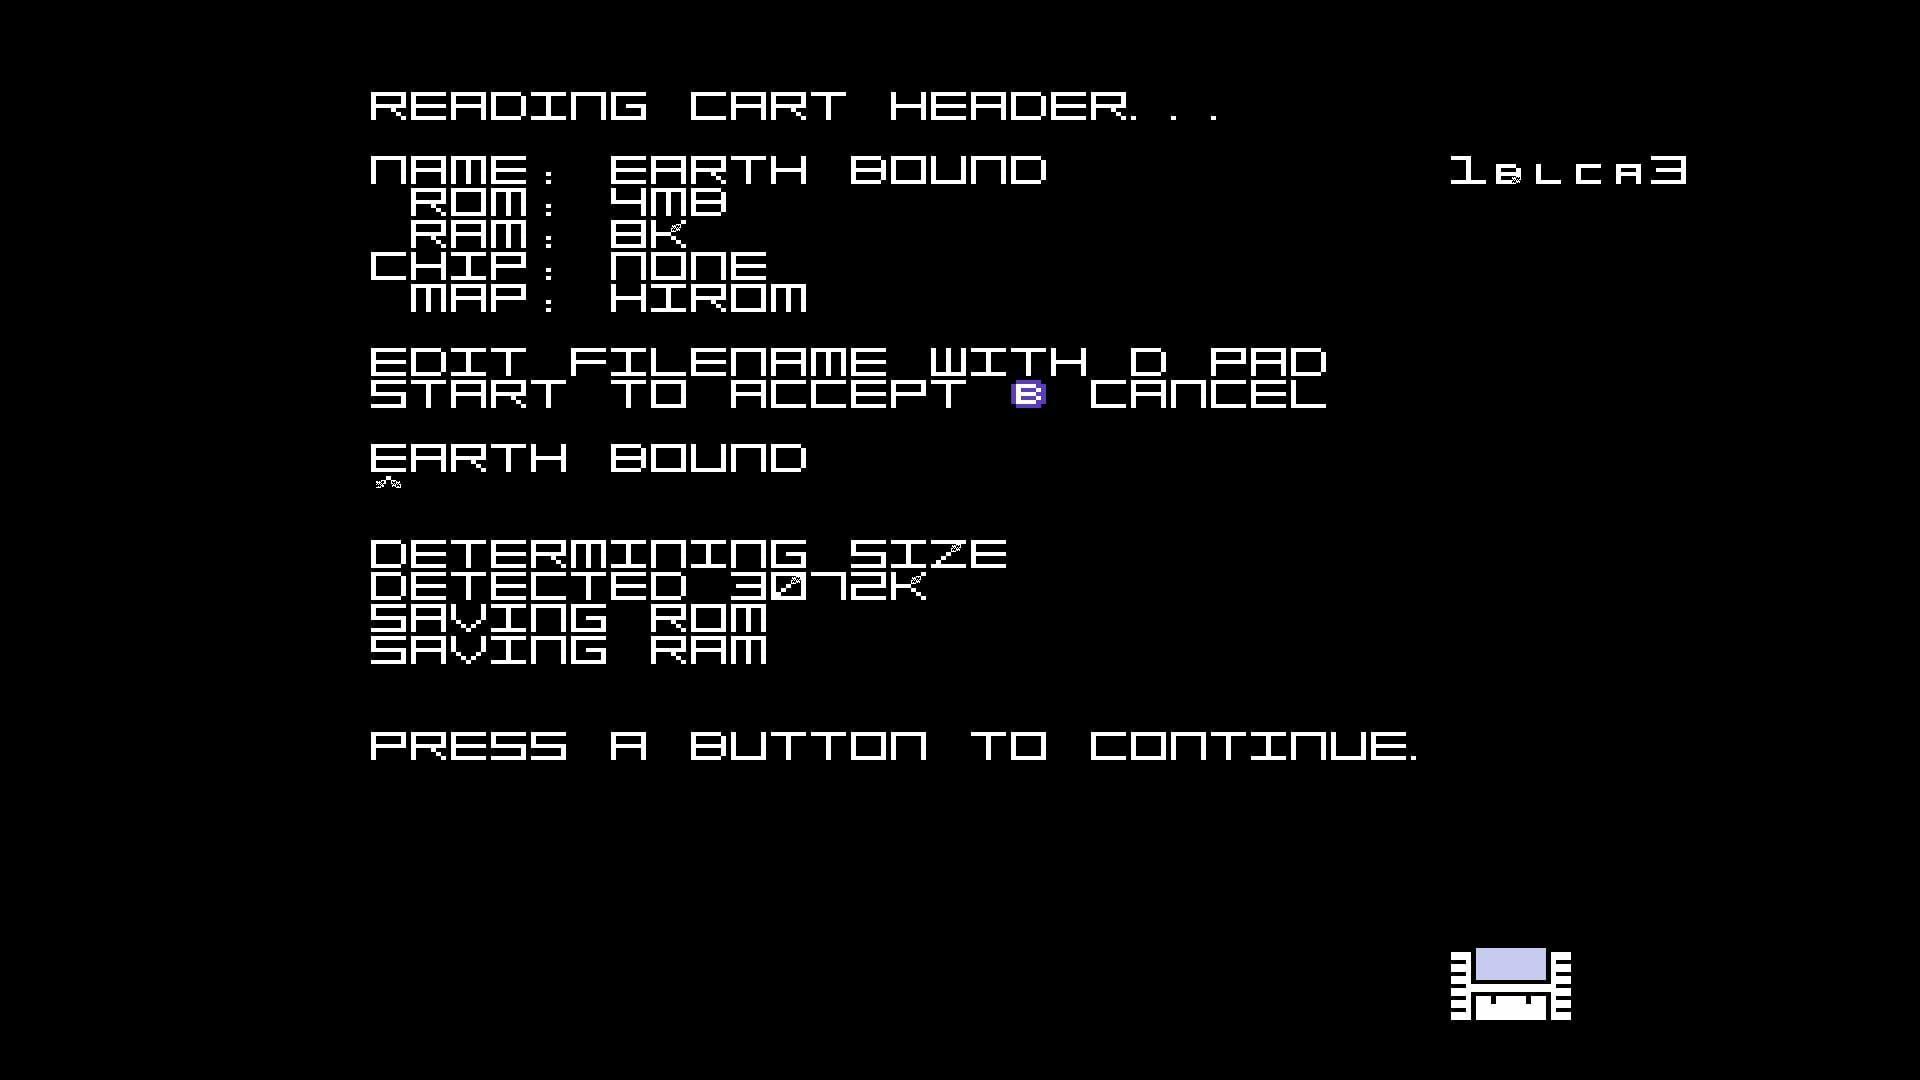 CopySNES completion screen